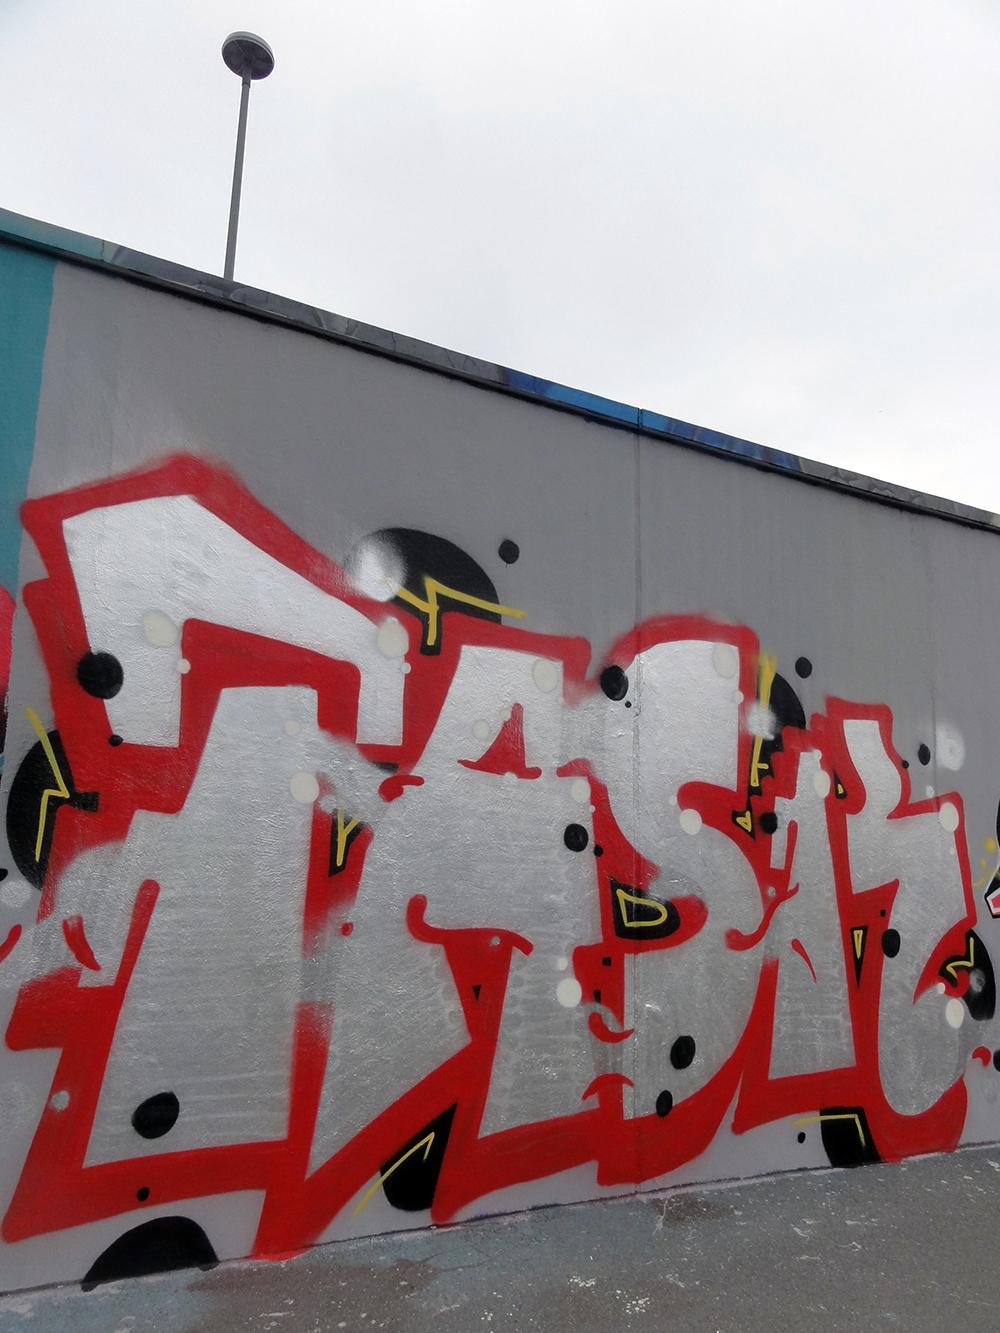 task-spade-hall-of-fame-frankfurt-am-main